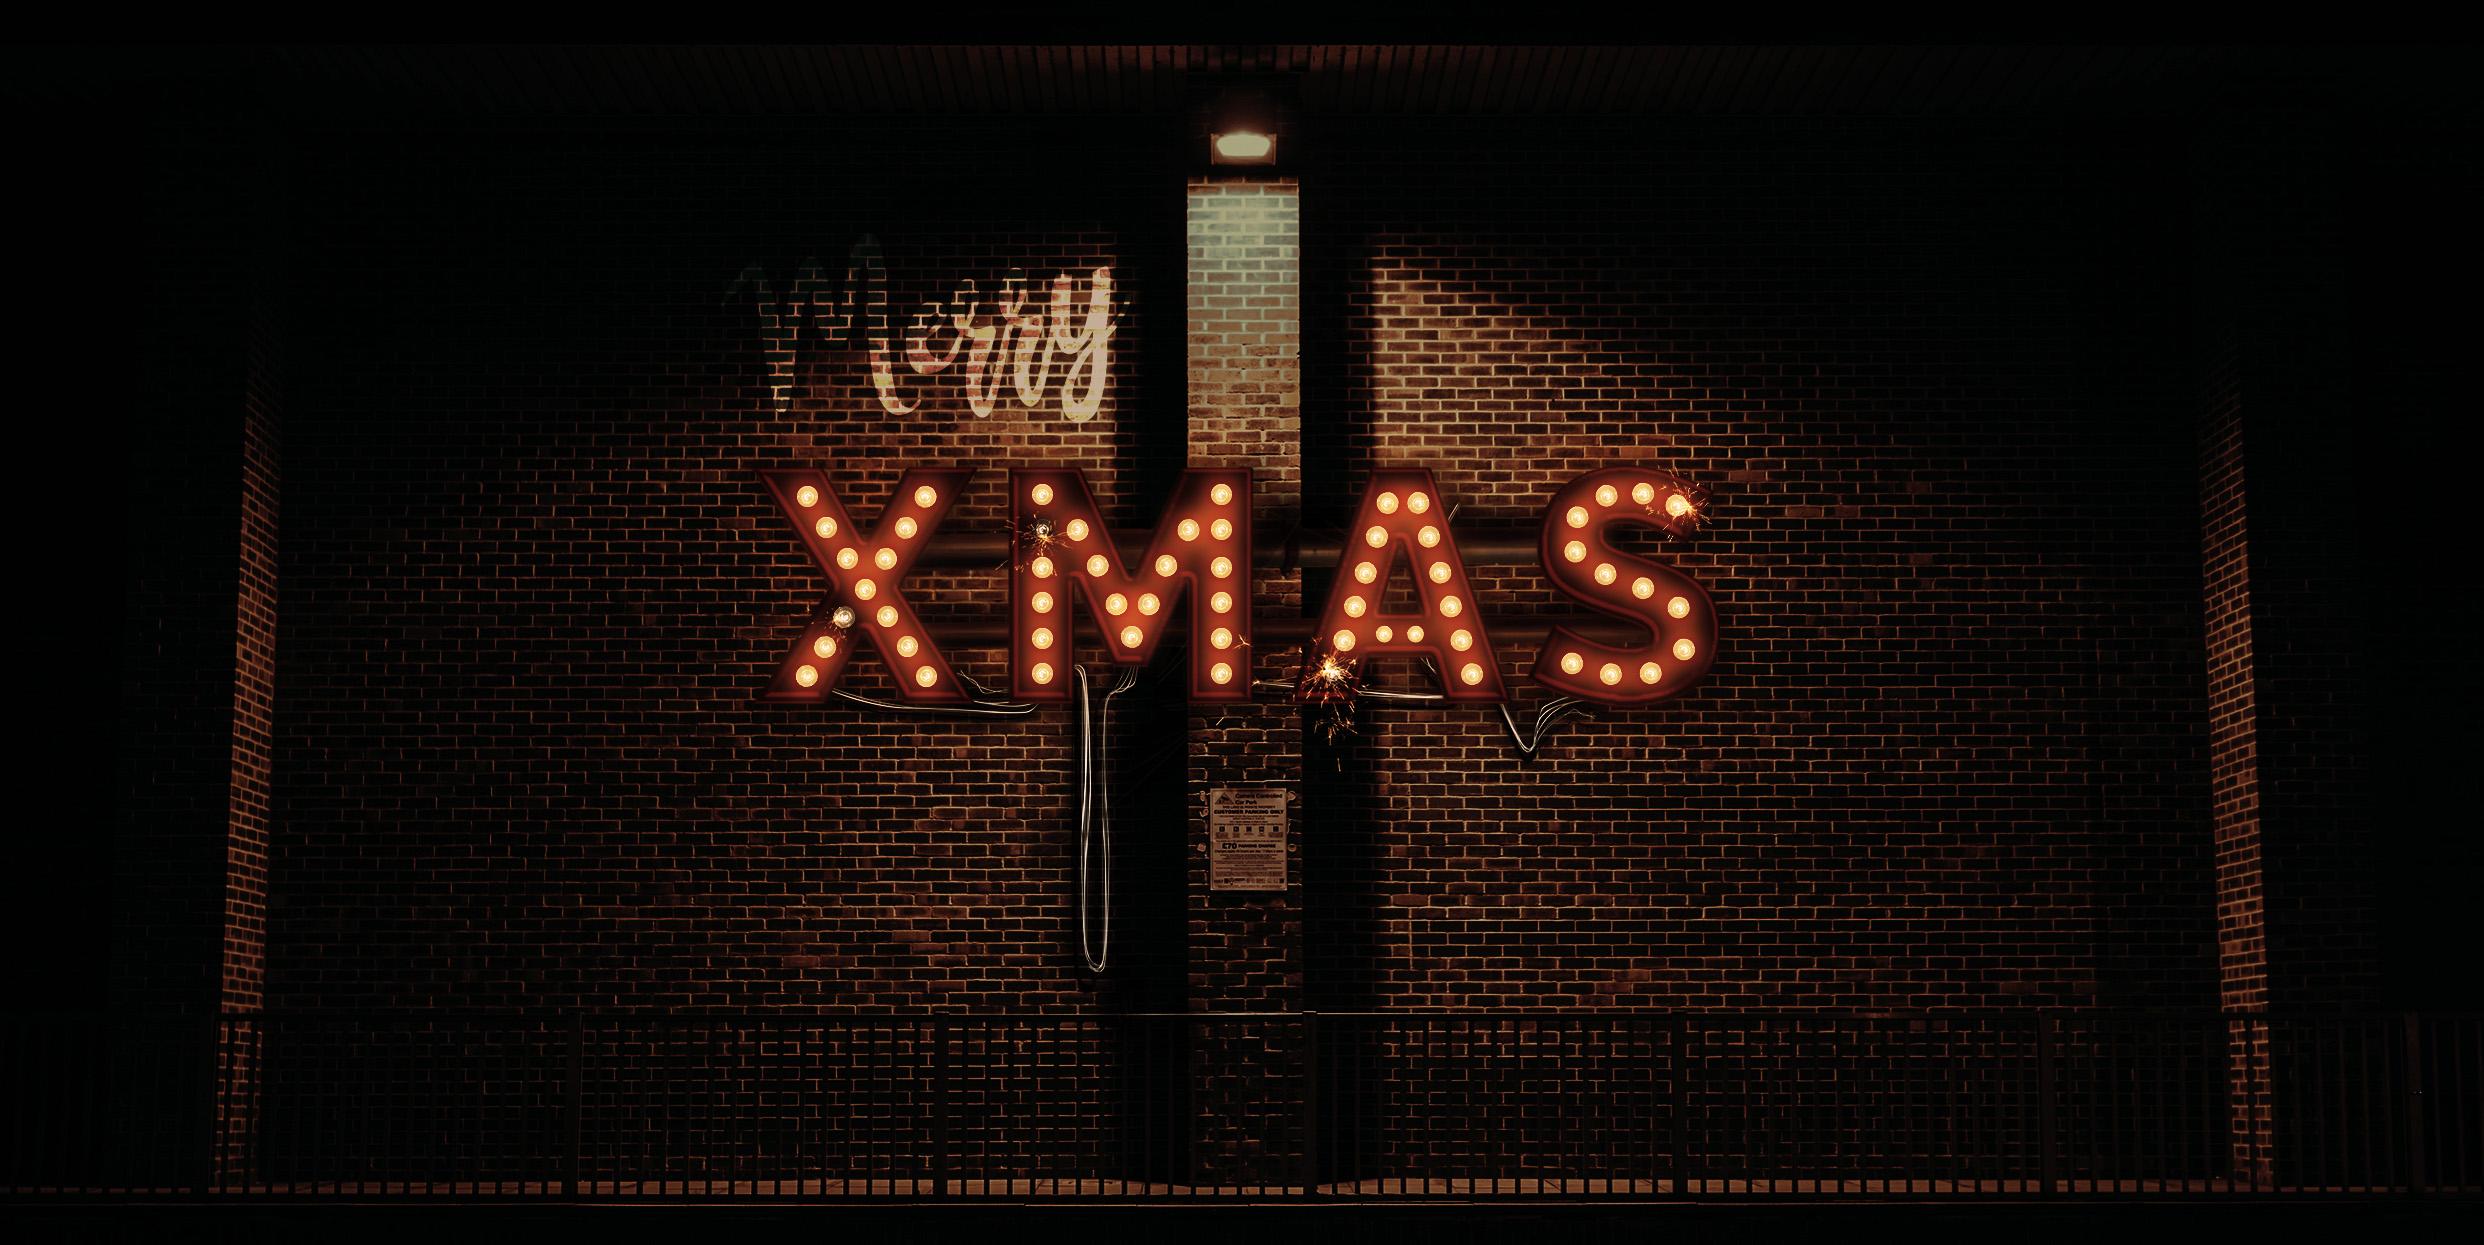 Lightbulb Merry Christmas Signs | 14-Image Bundle example image 2